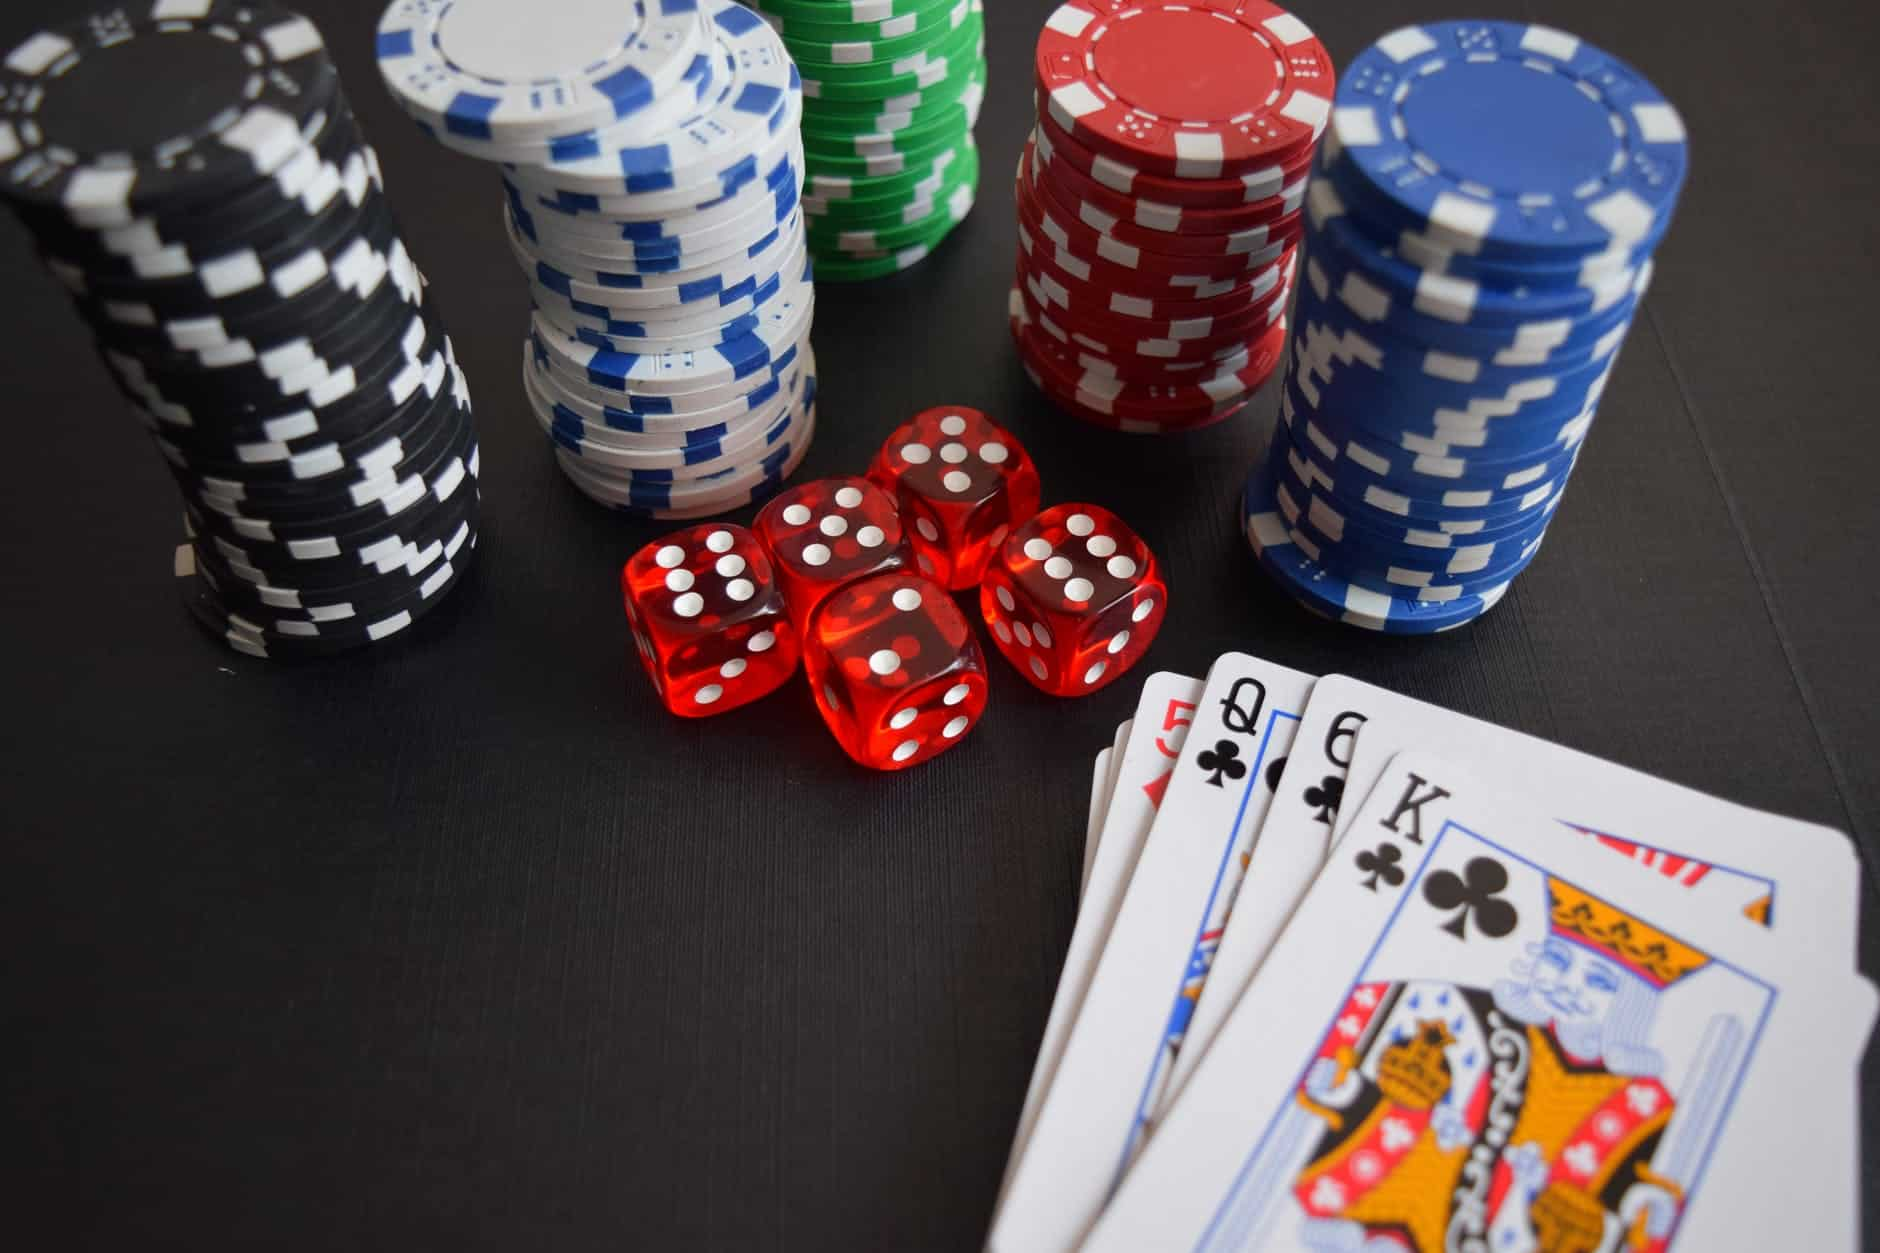 Grote casino's zetten in op poker na pandemie